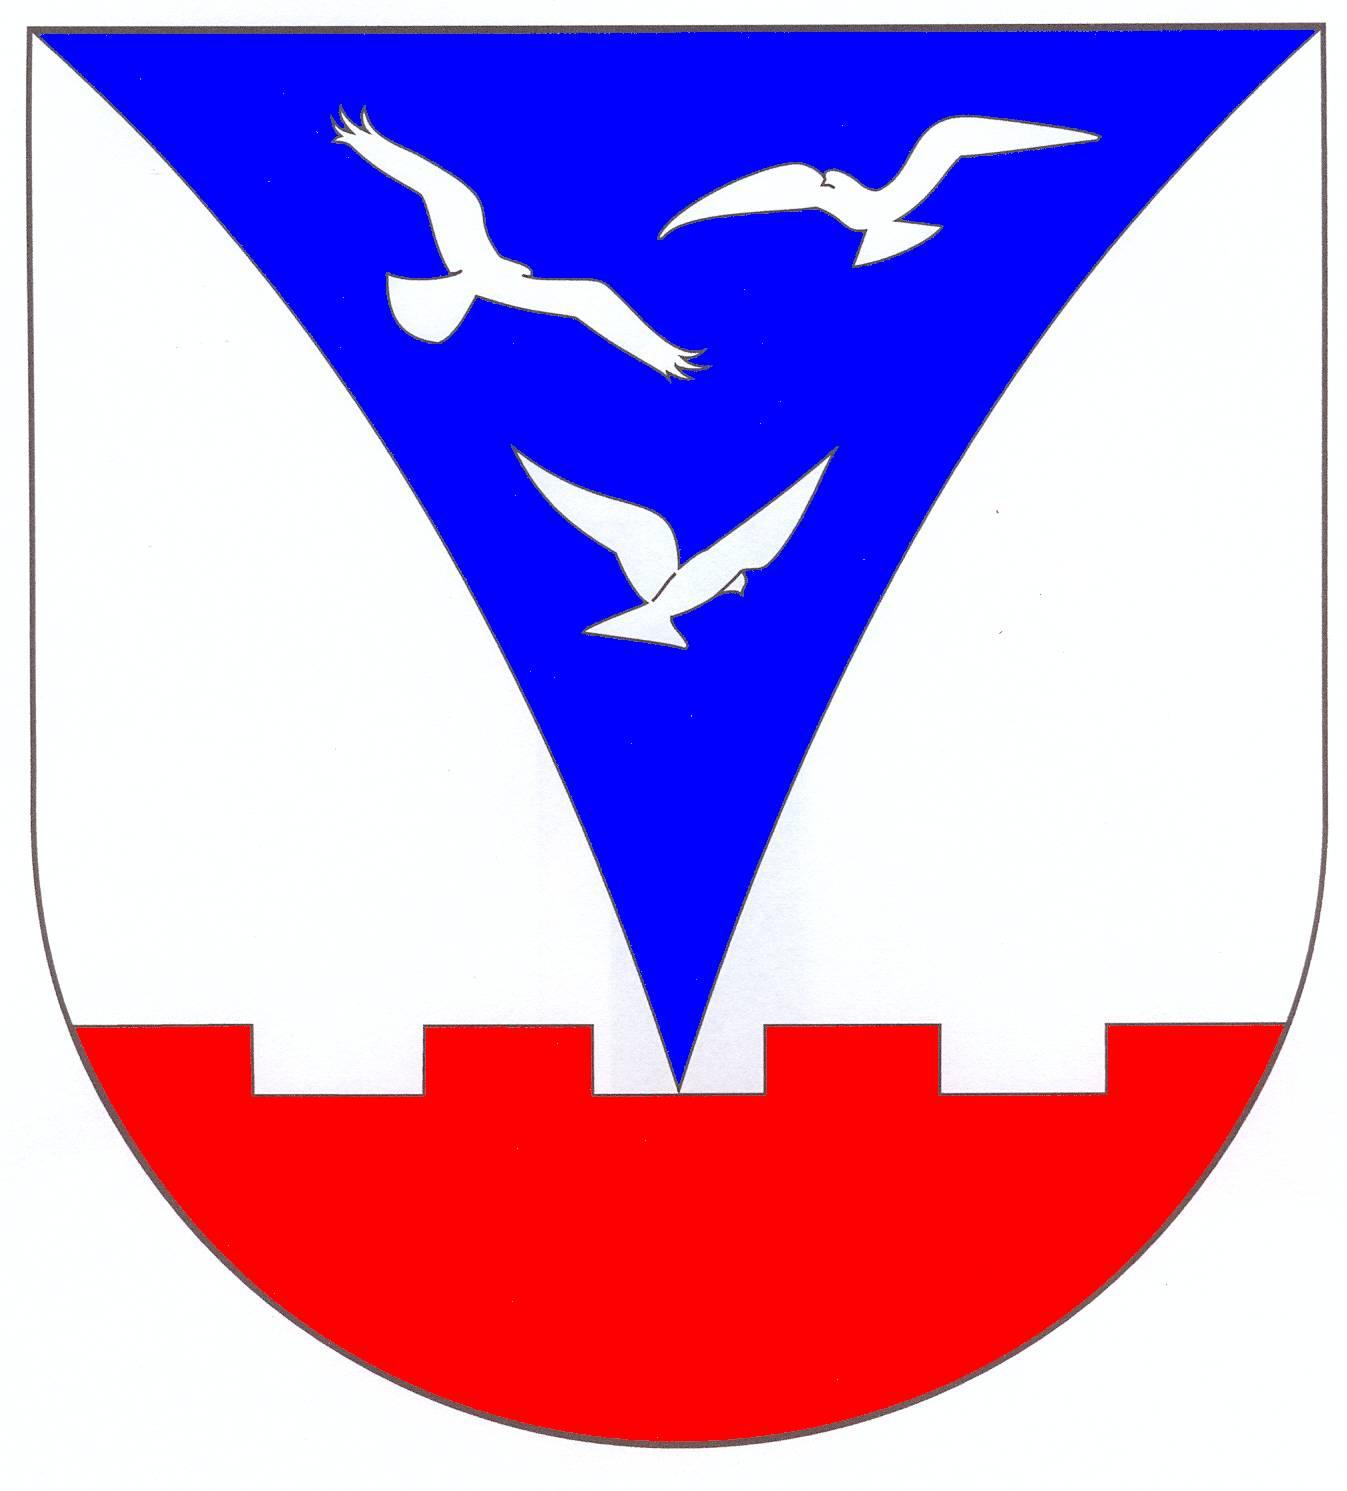 Wappen GemeindeHaale, Kreis Rendsburg-Eckernförde